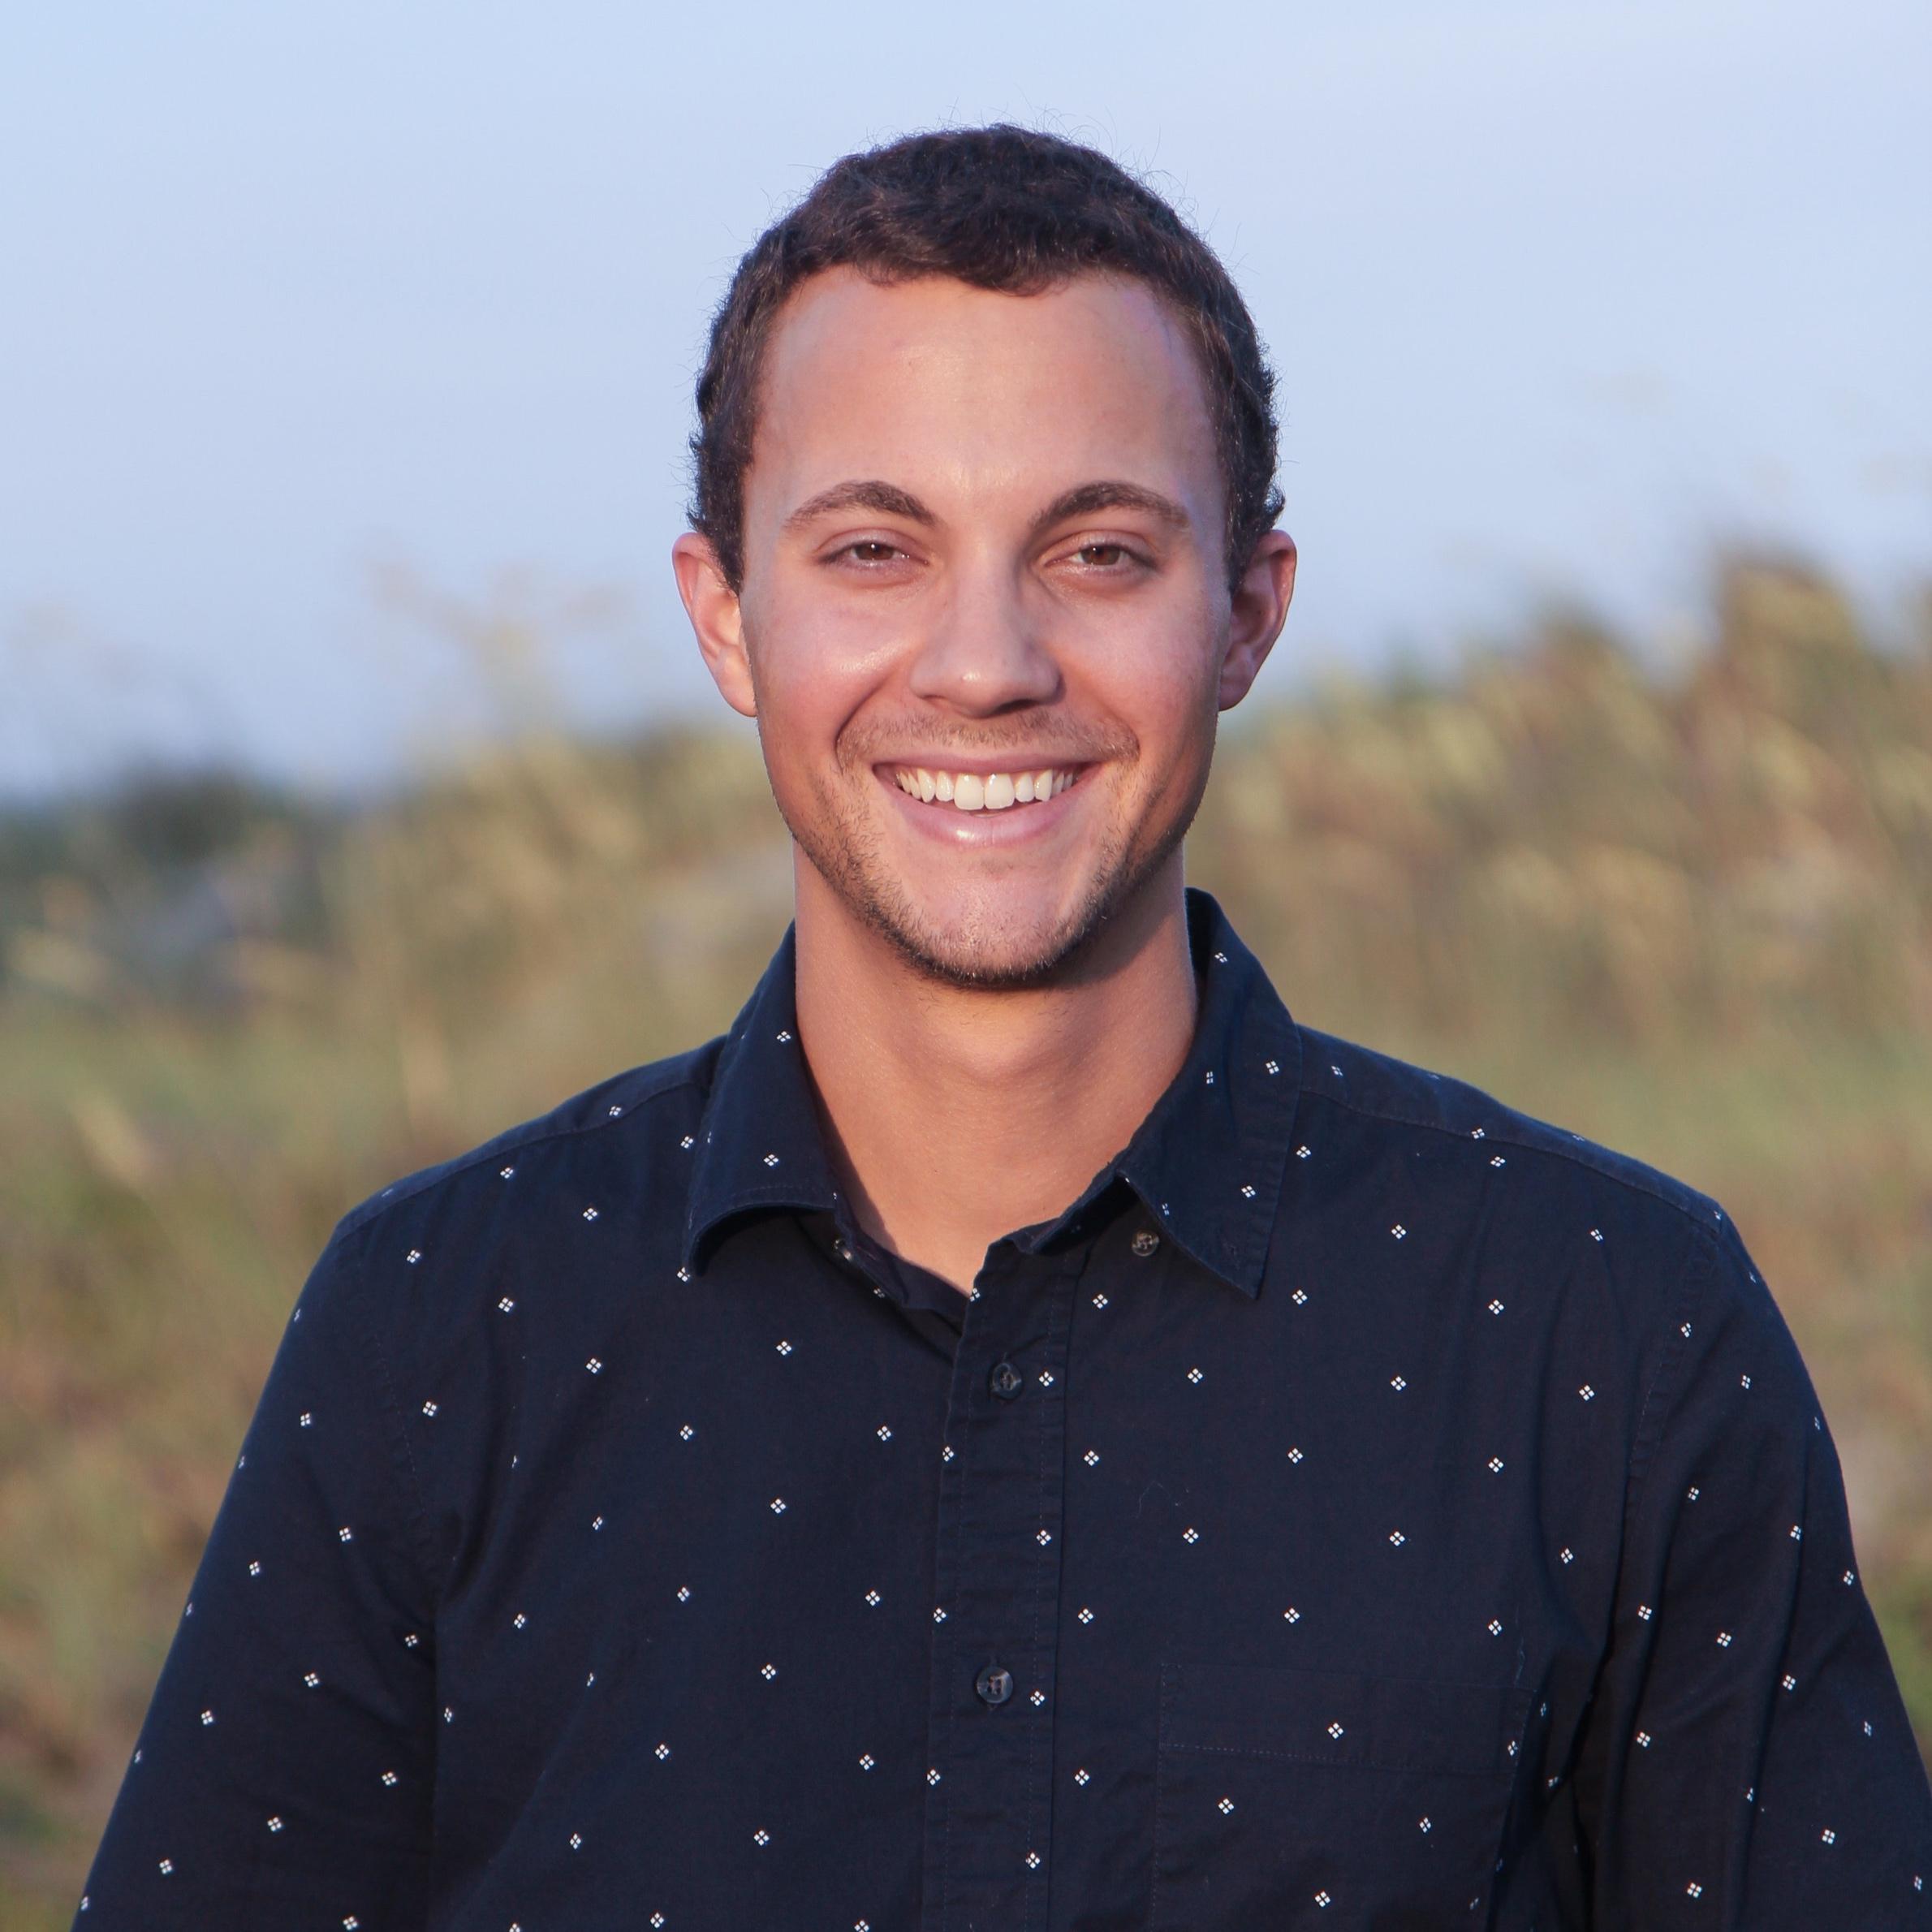 Brody Henson